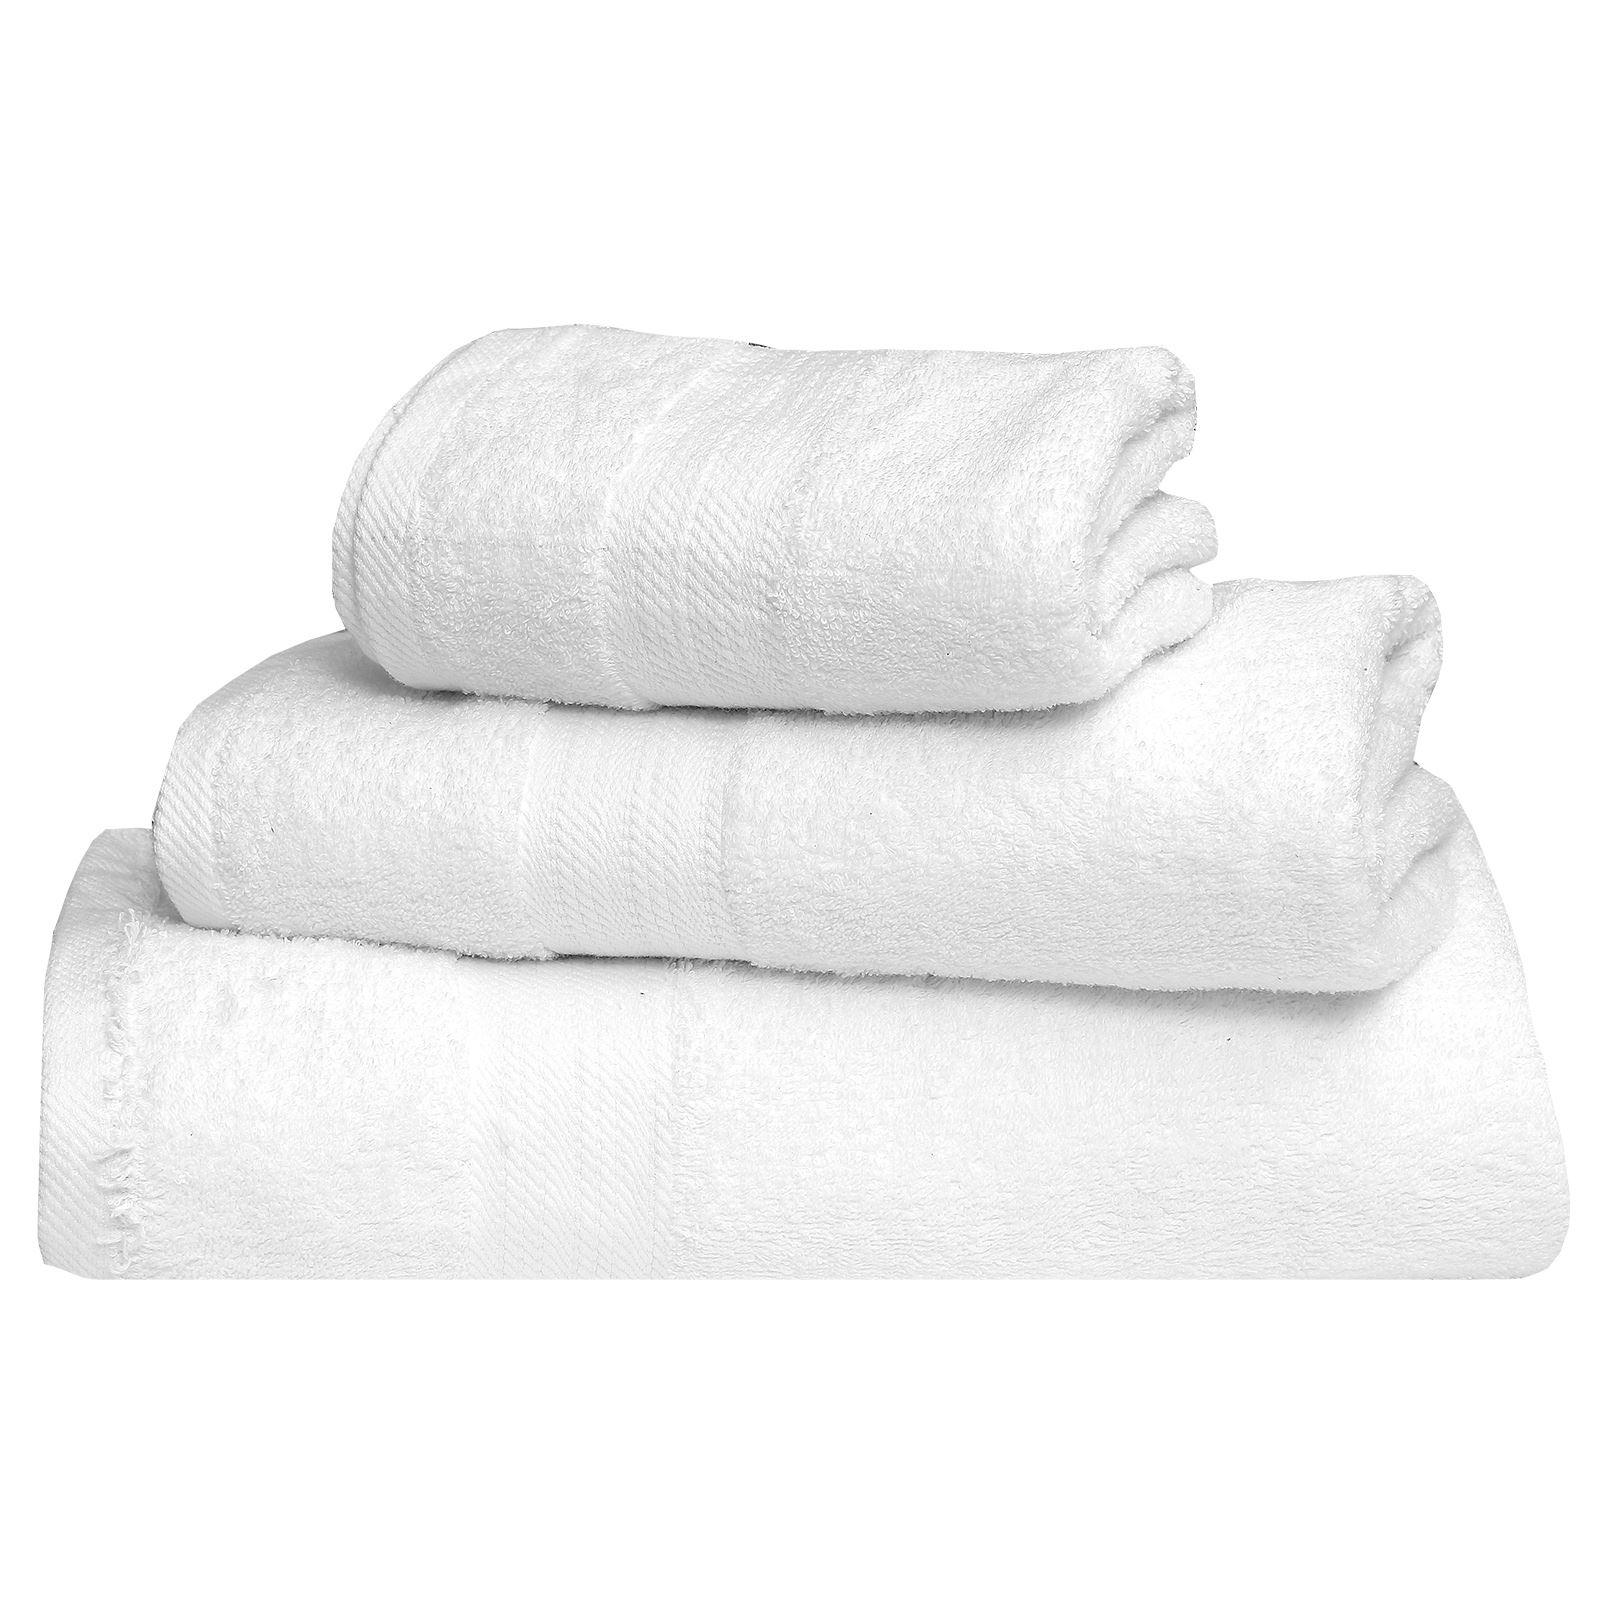 Super Jumbo Bath Sheets 100 Egyptian Cotton Extra Large Bath Sheet Towels 100 X 200 Cm 800 Gsm Black 1 Bathroom Bath Sheets